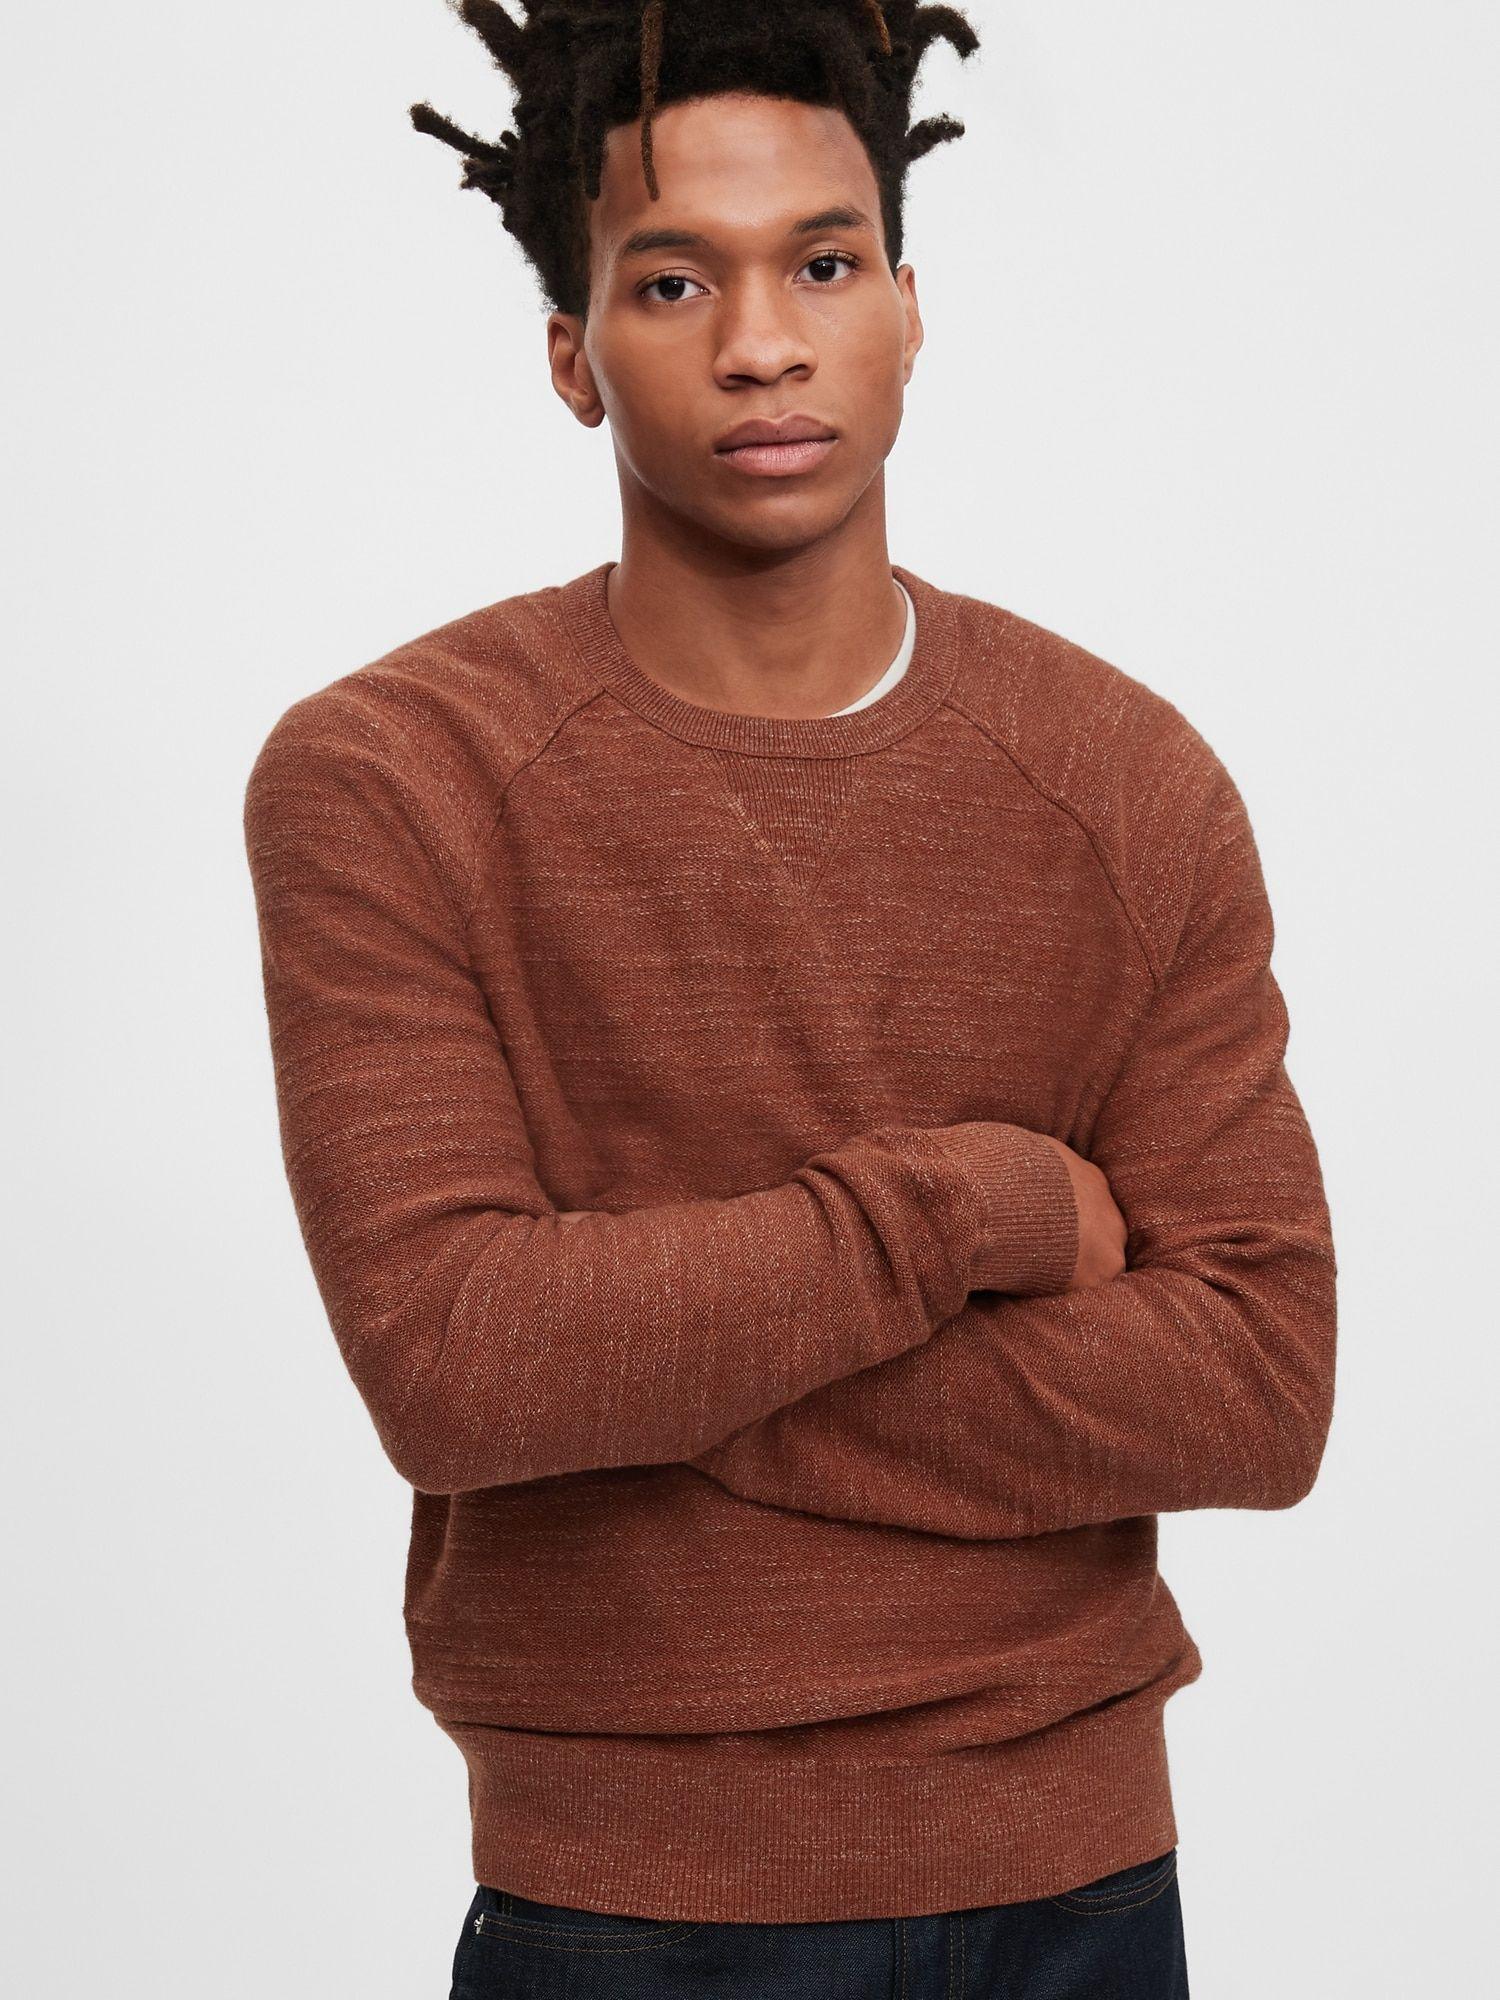 Cozy Classic Crewneck Sweater Crew Neck Sweater Sweaters Soft Knits [ 2000 x 1500 Pixel ]